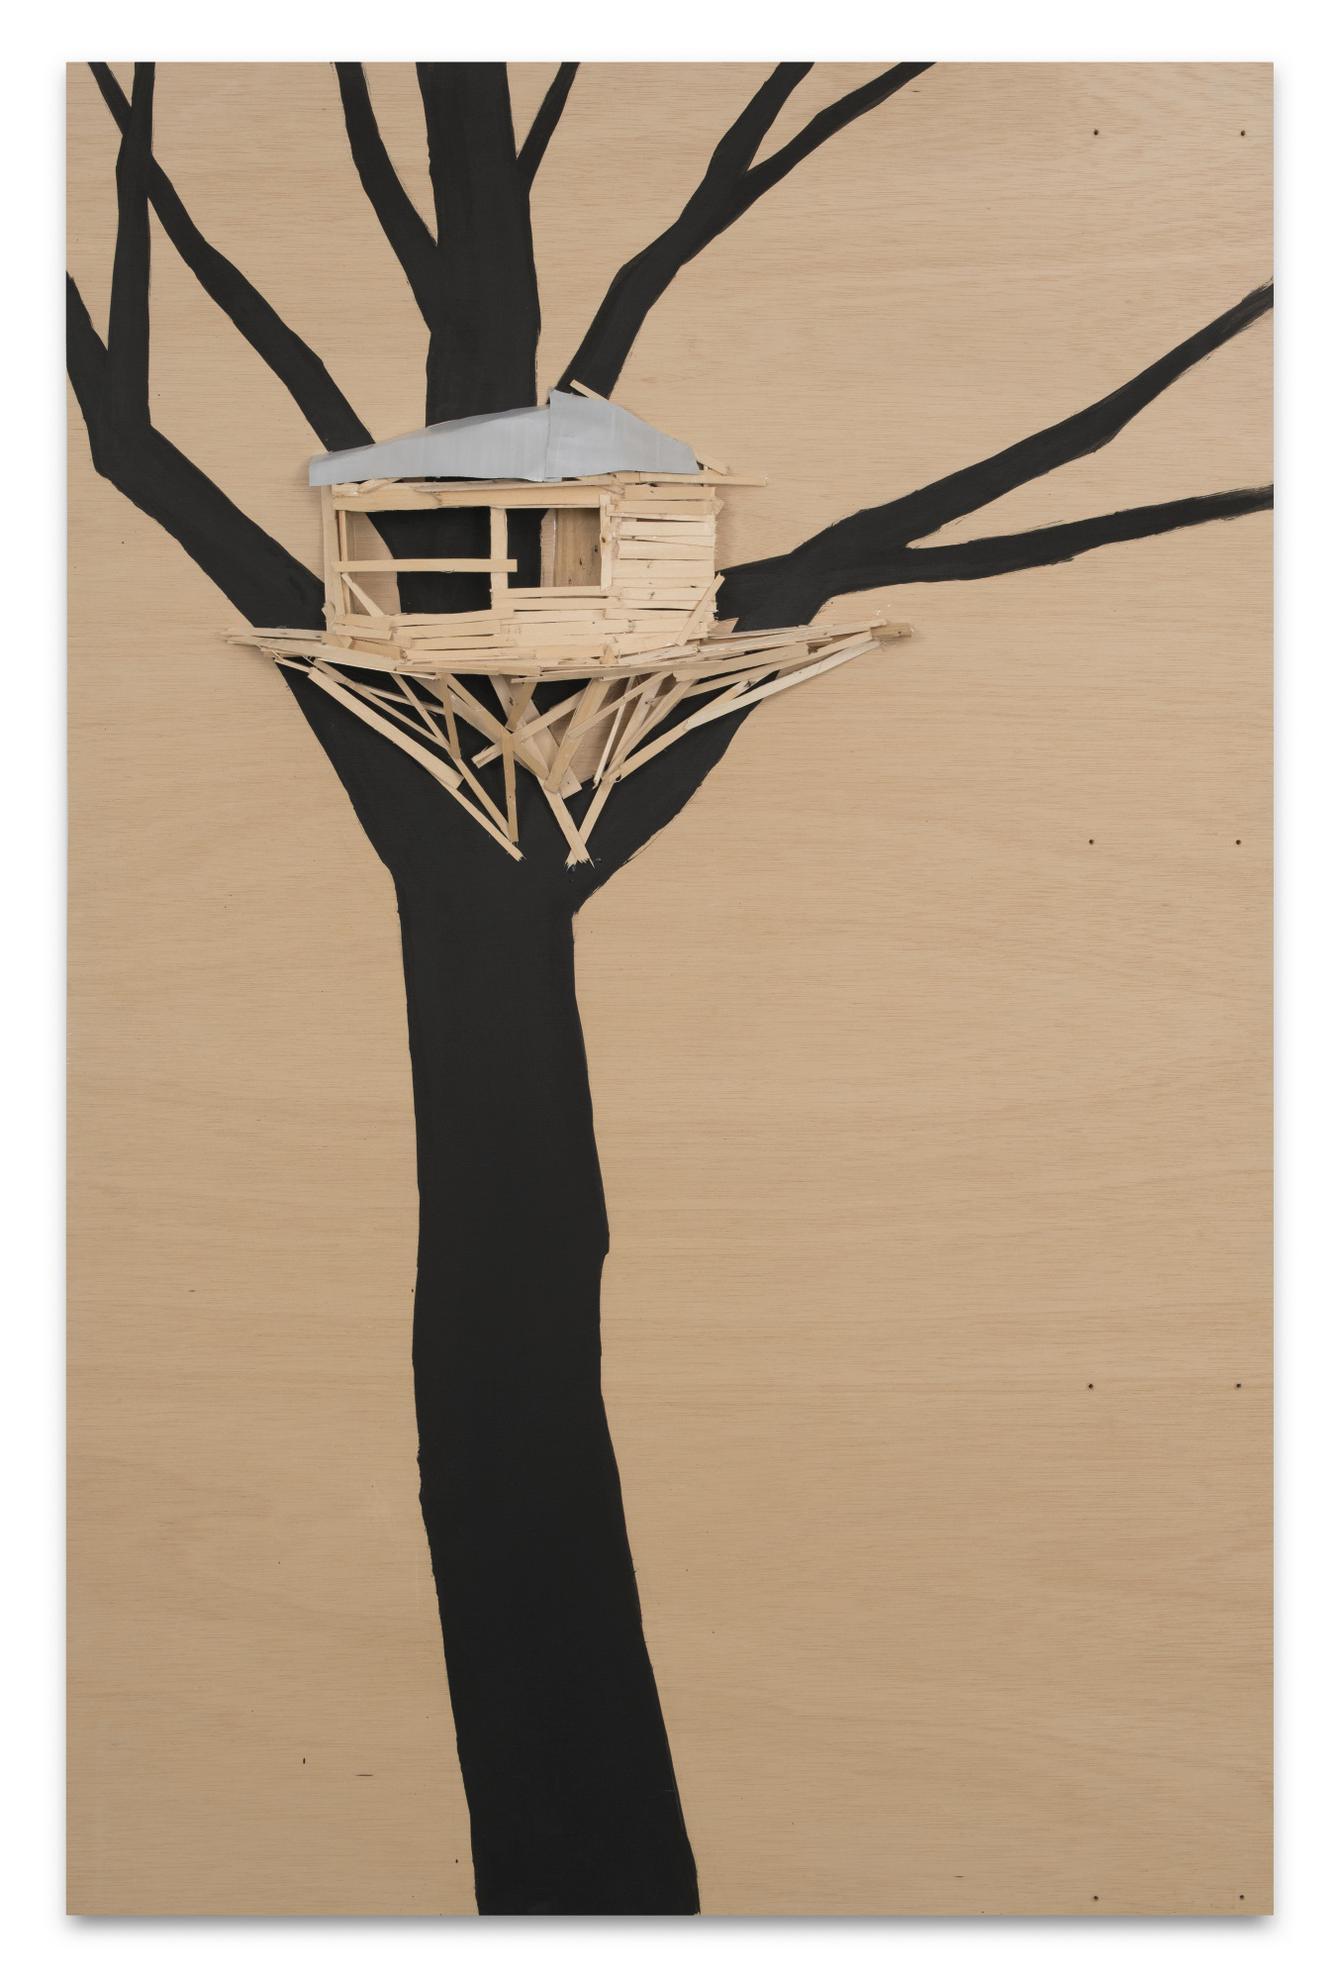 Tadashi Kawamata-Tree Hut In Tuileries-2011